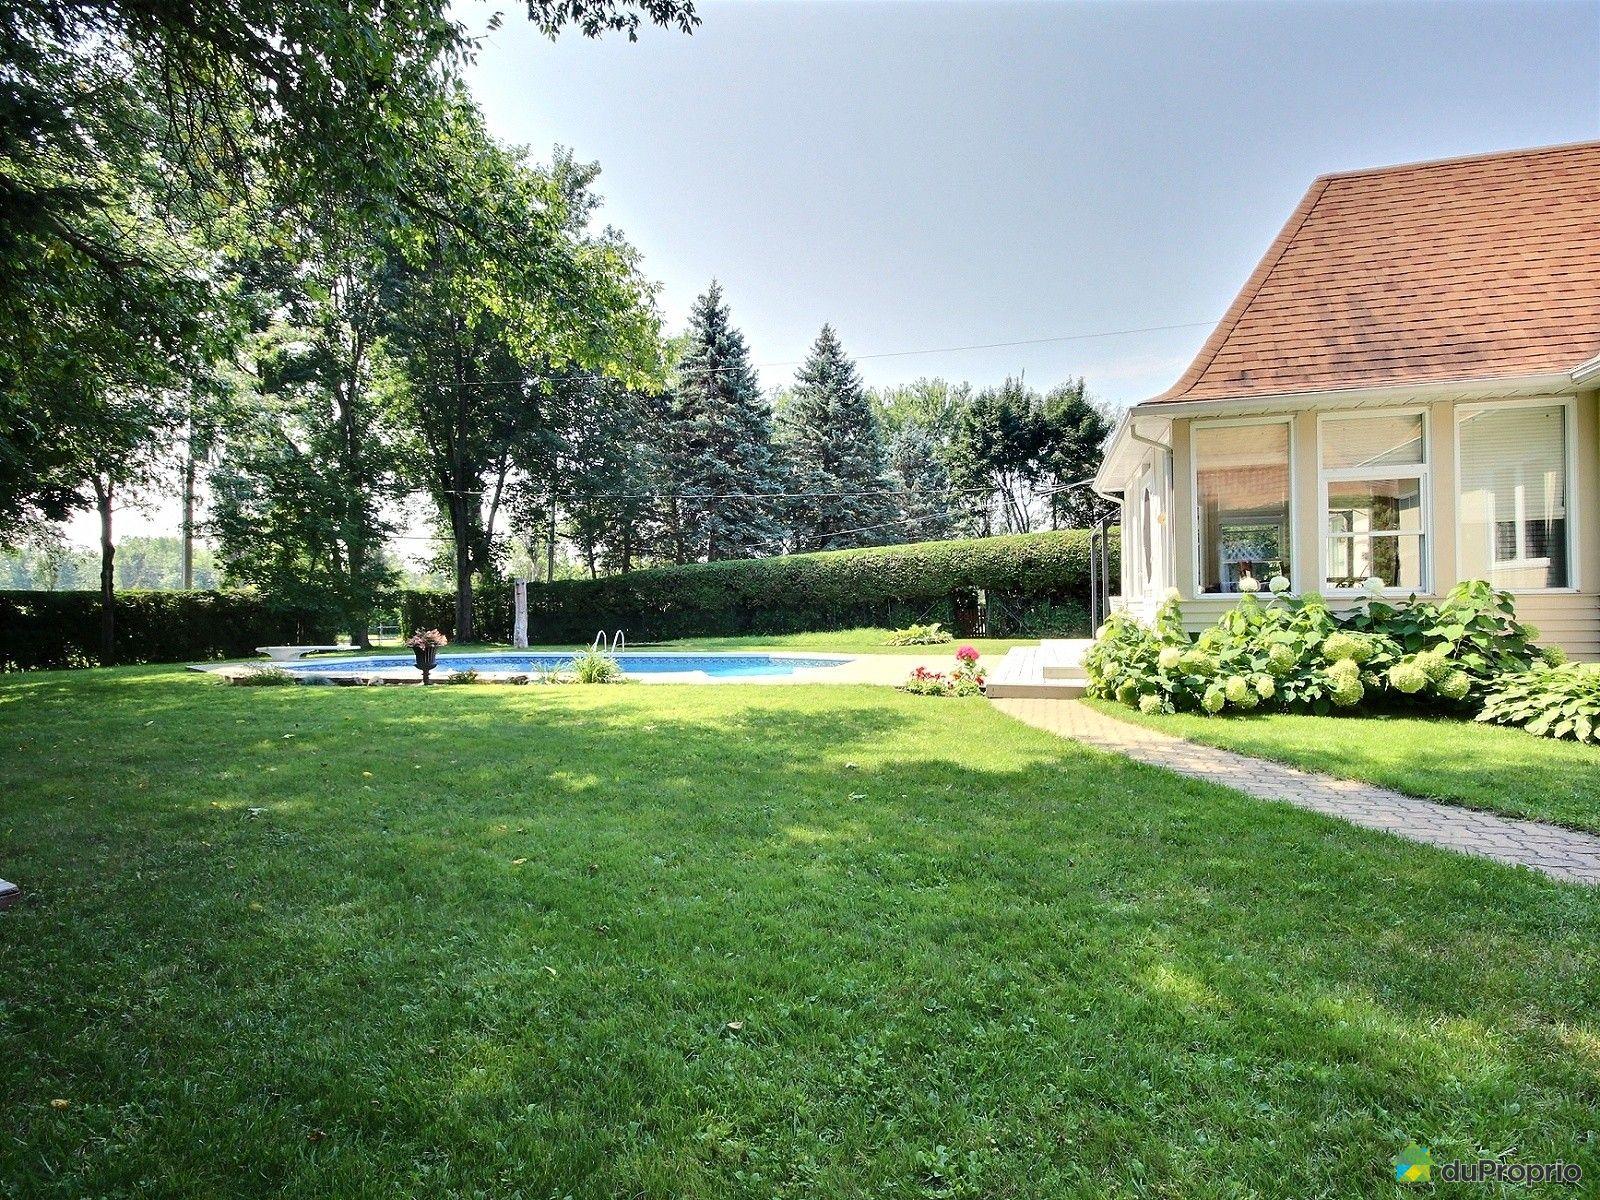 Maison vendre st bruno de montarville 620 rue croisille for Piscine radiant quebec